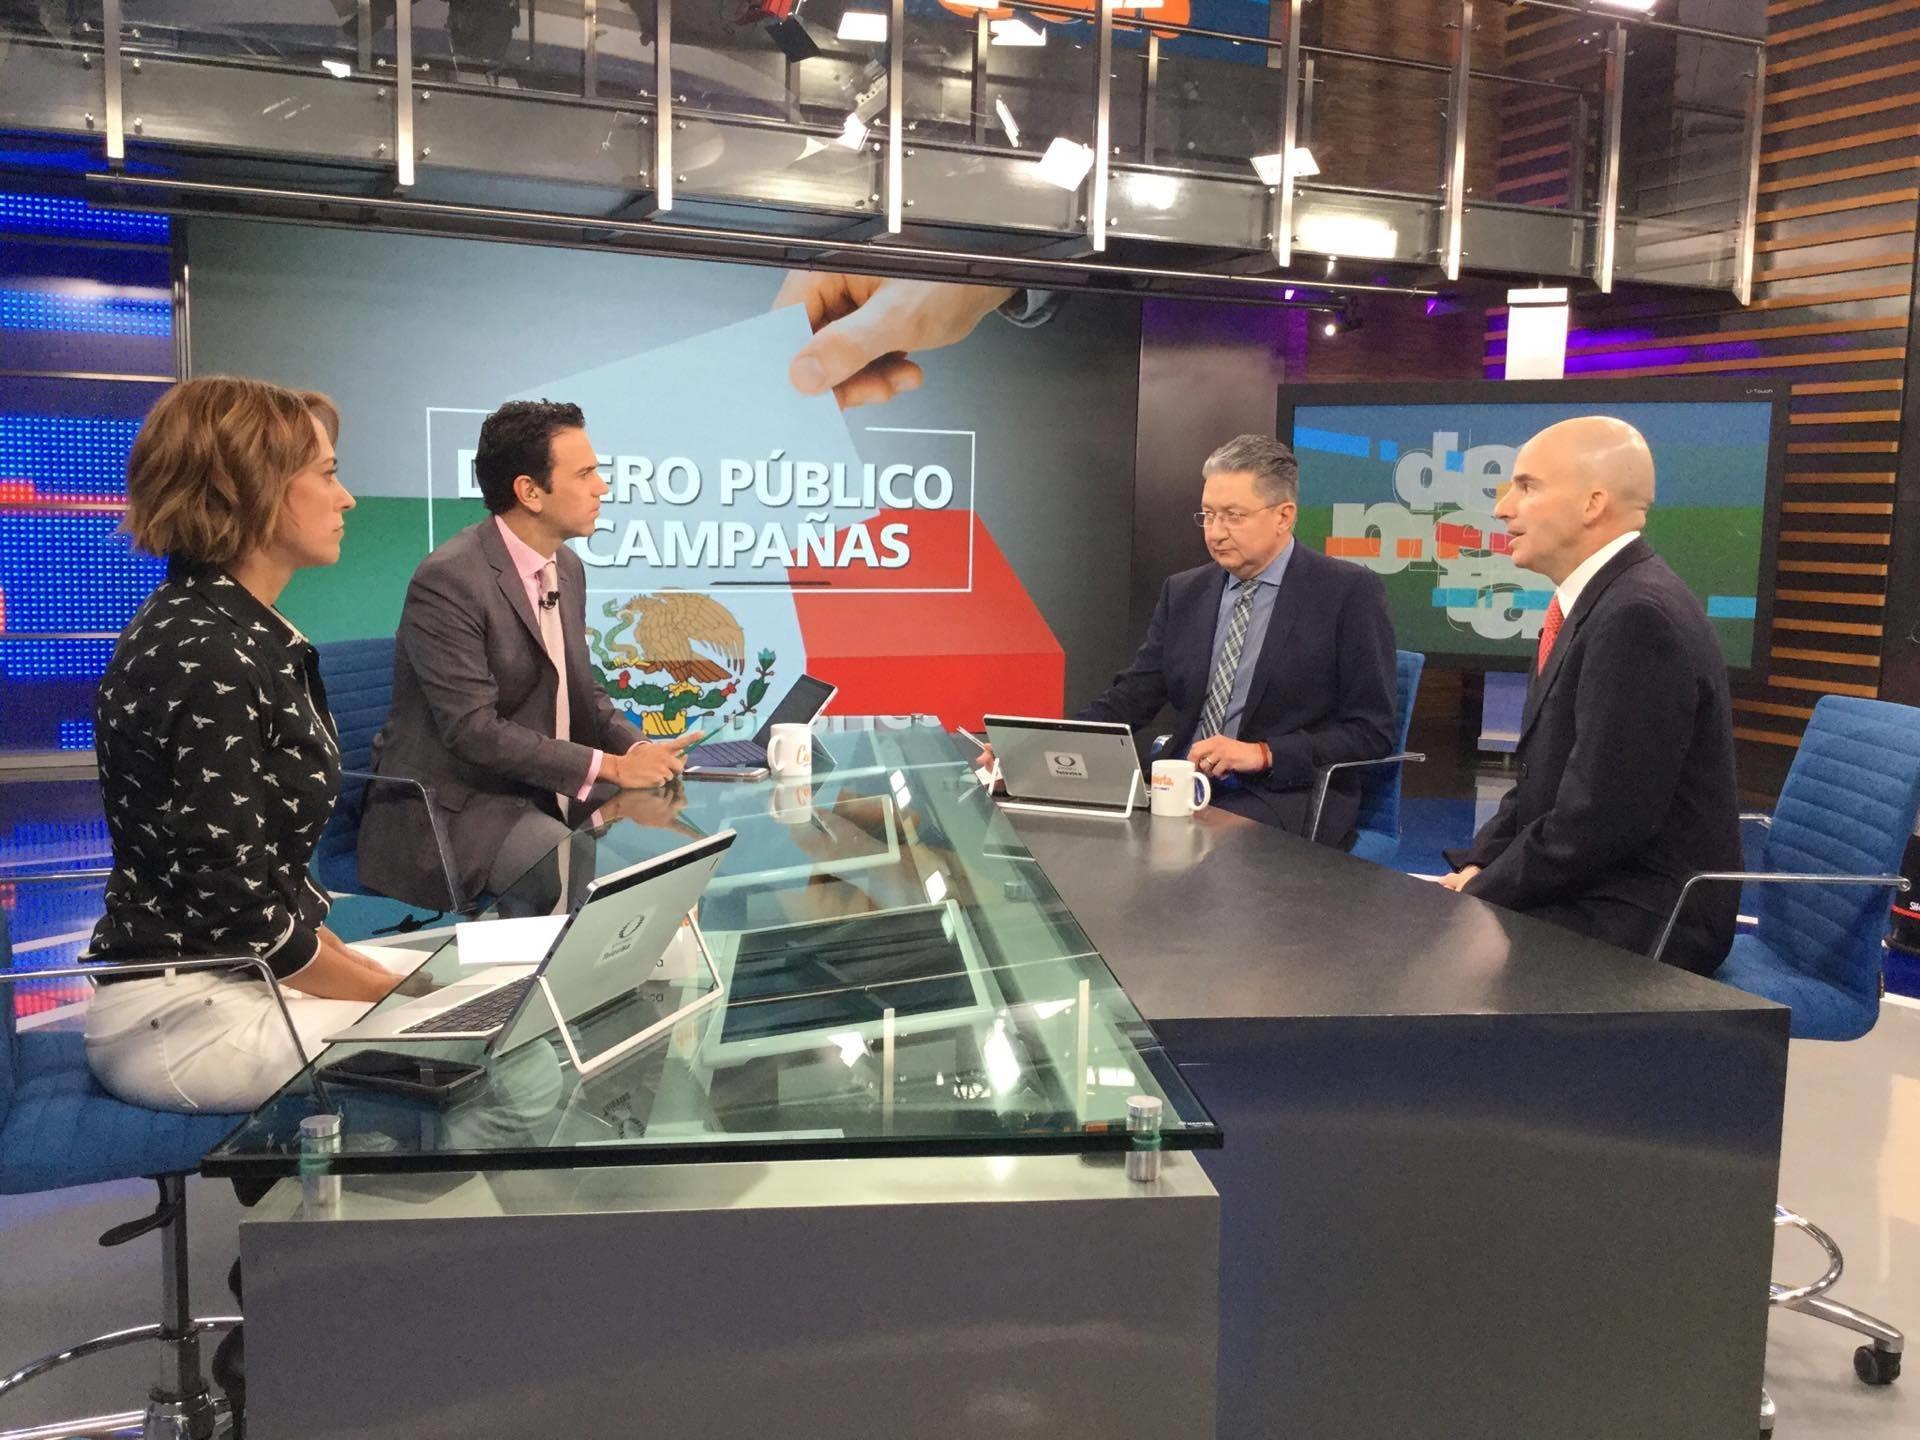 México mantendrá la política económica para dar certidumbre: González Anaya